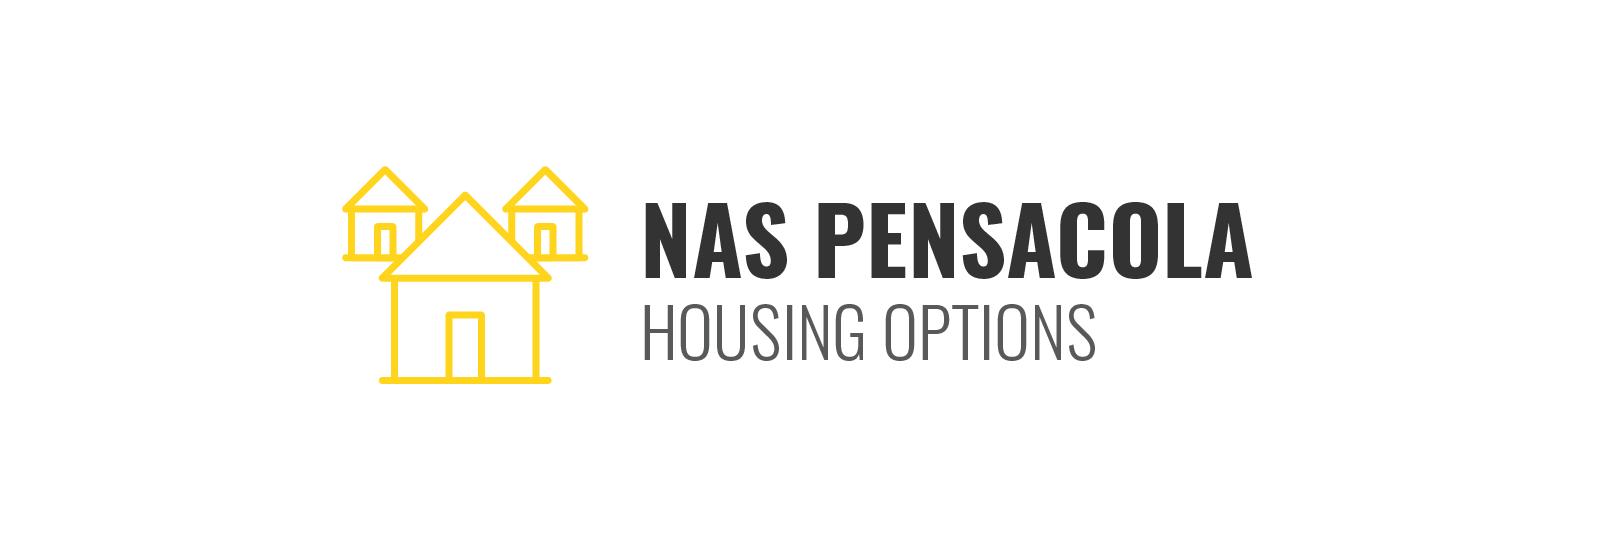 NAS Pensacola Housing Options